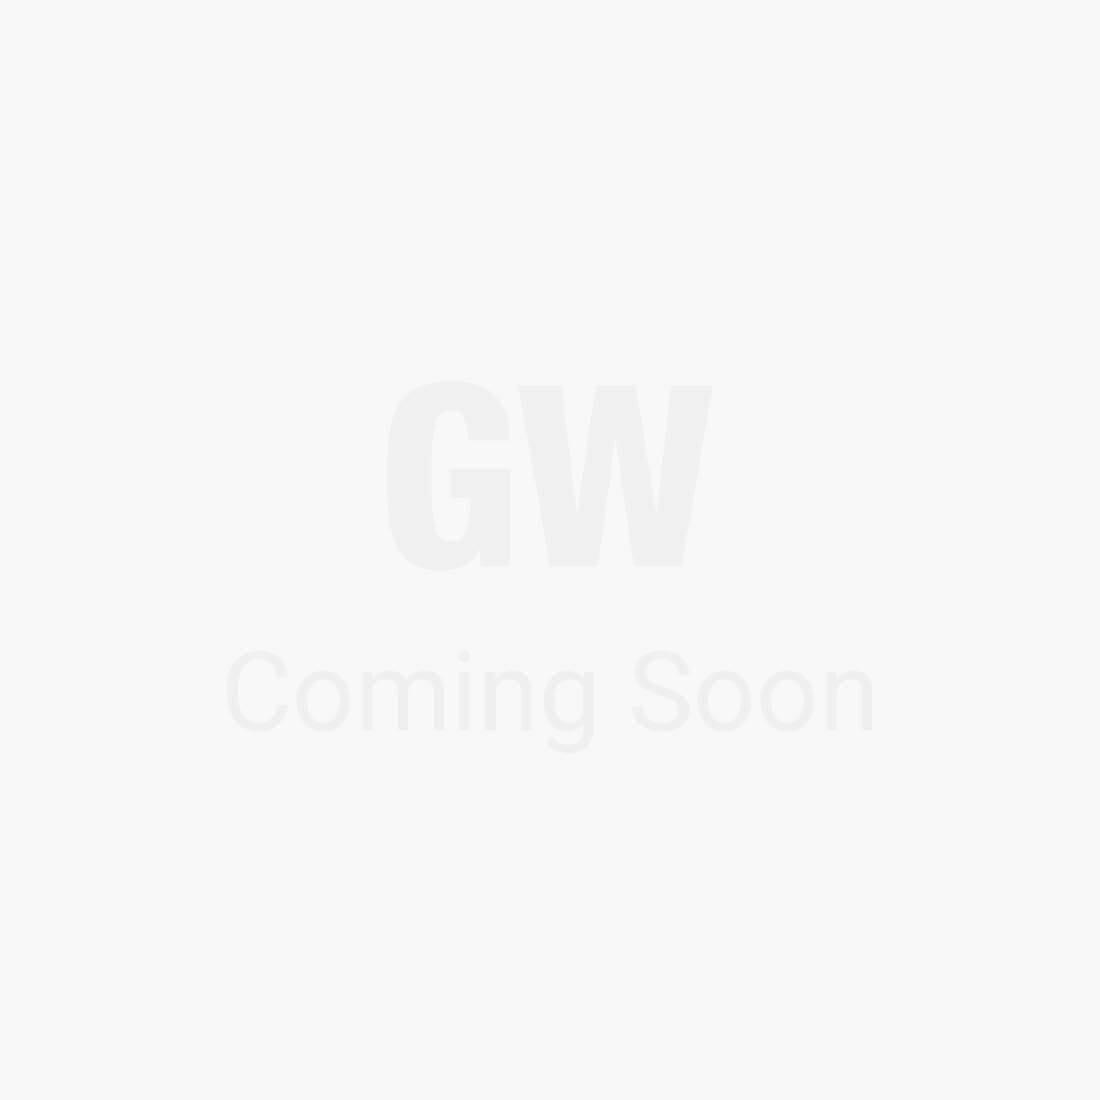 Lark Woven Low Set of 2 Bowls